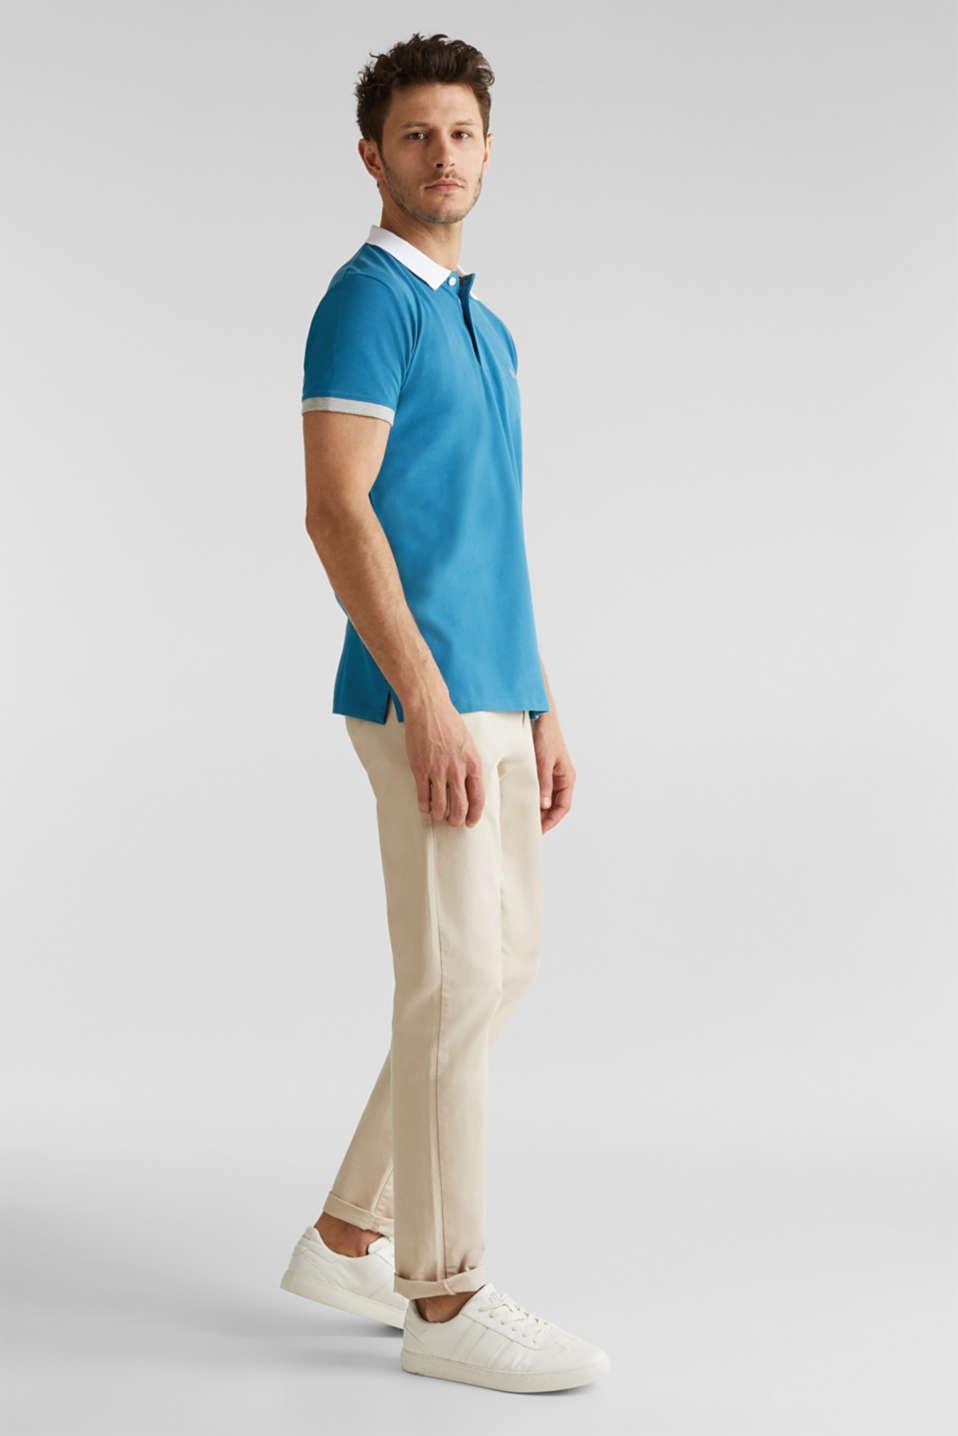 Stretch cotton piqué polo shirt, PETROL BLUE 2, detail image number 4